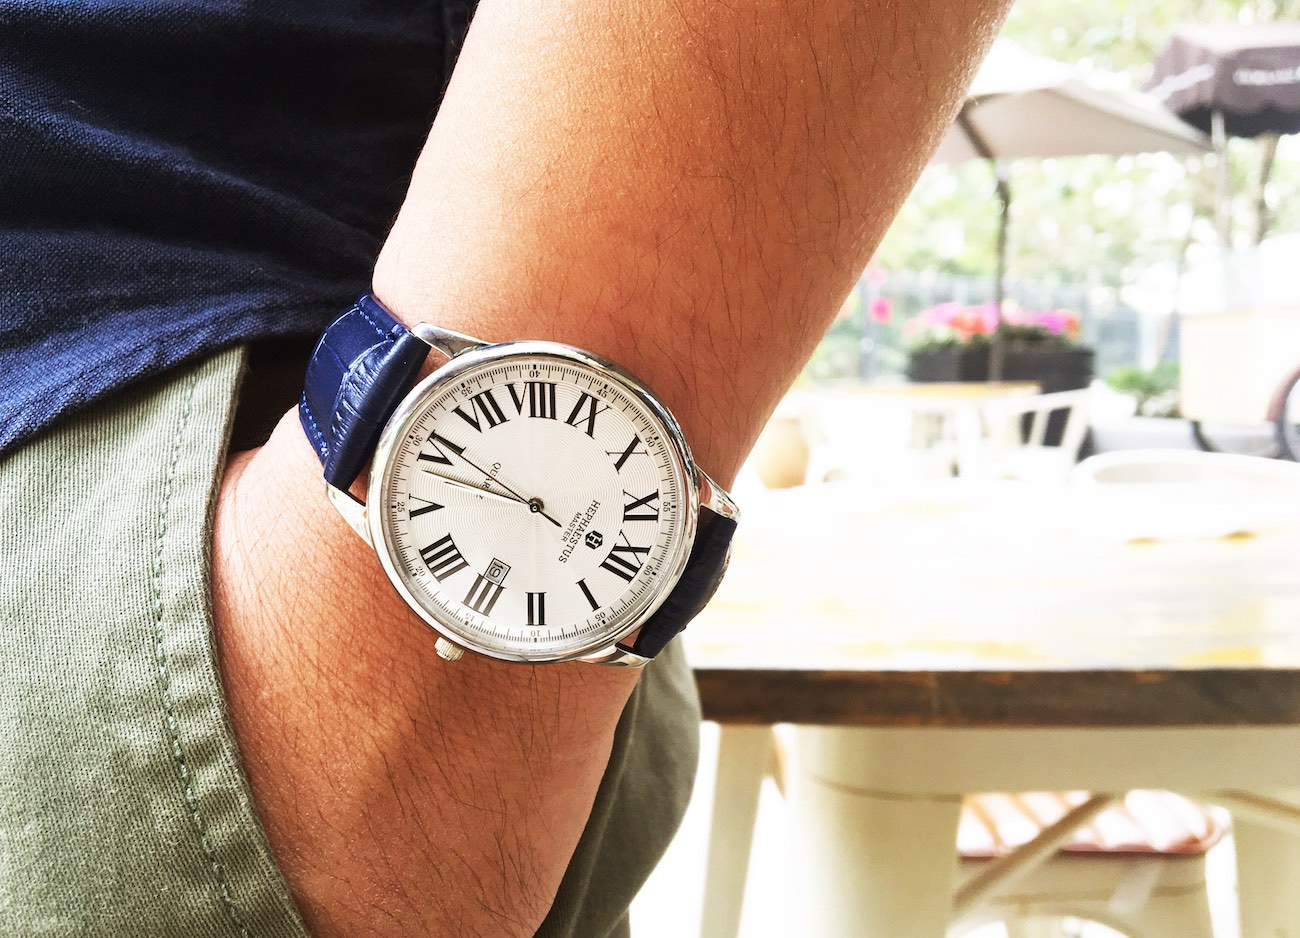 Hephaestus Master Custom Engraving Watches